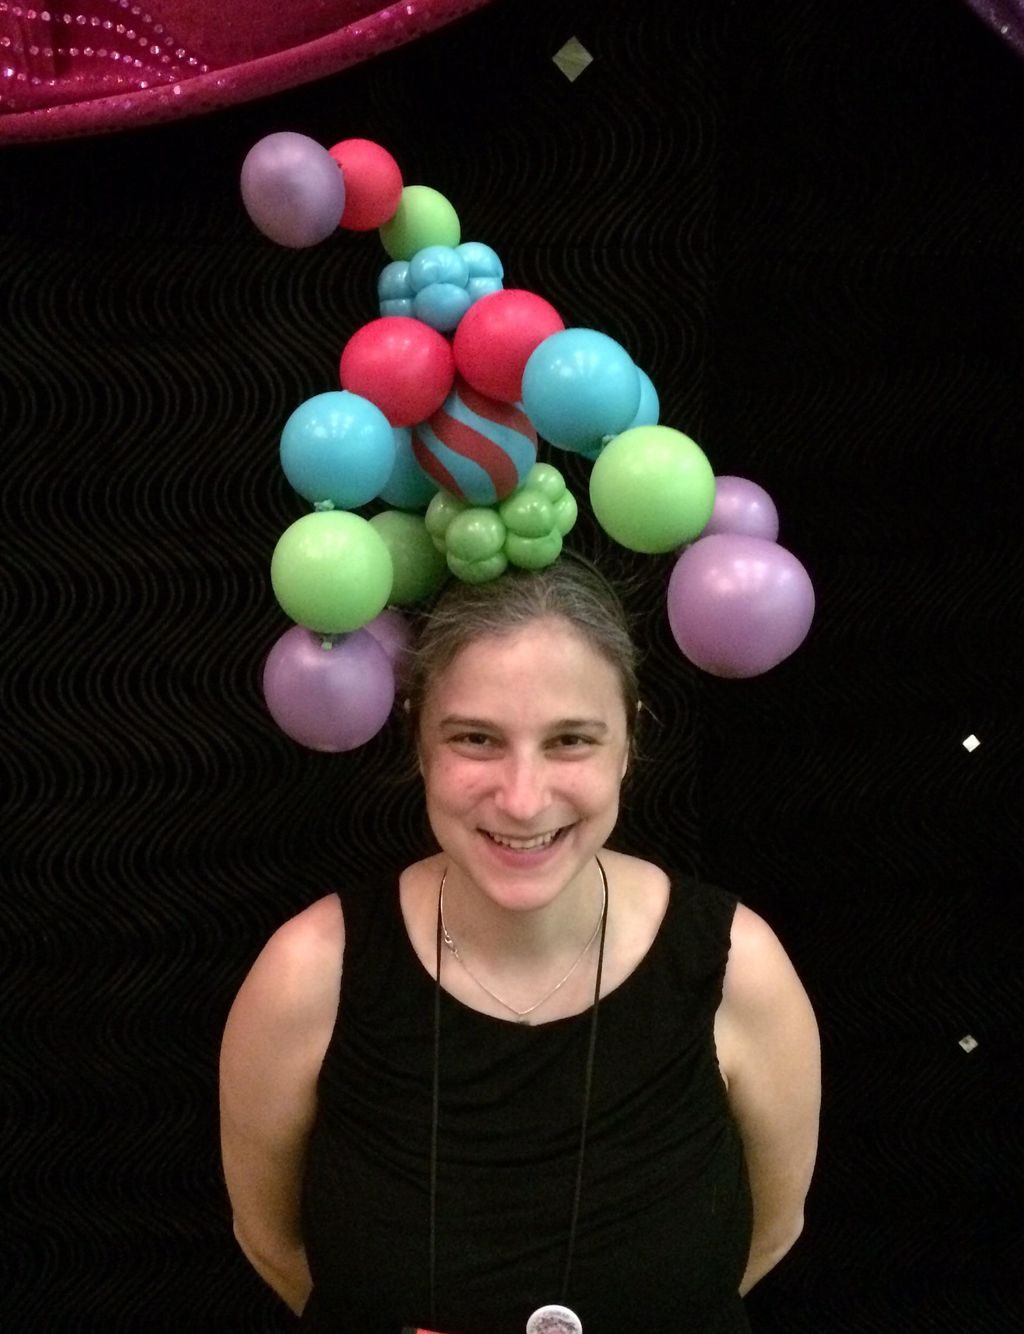 GlobeTwisting Balloons